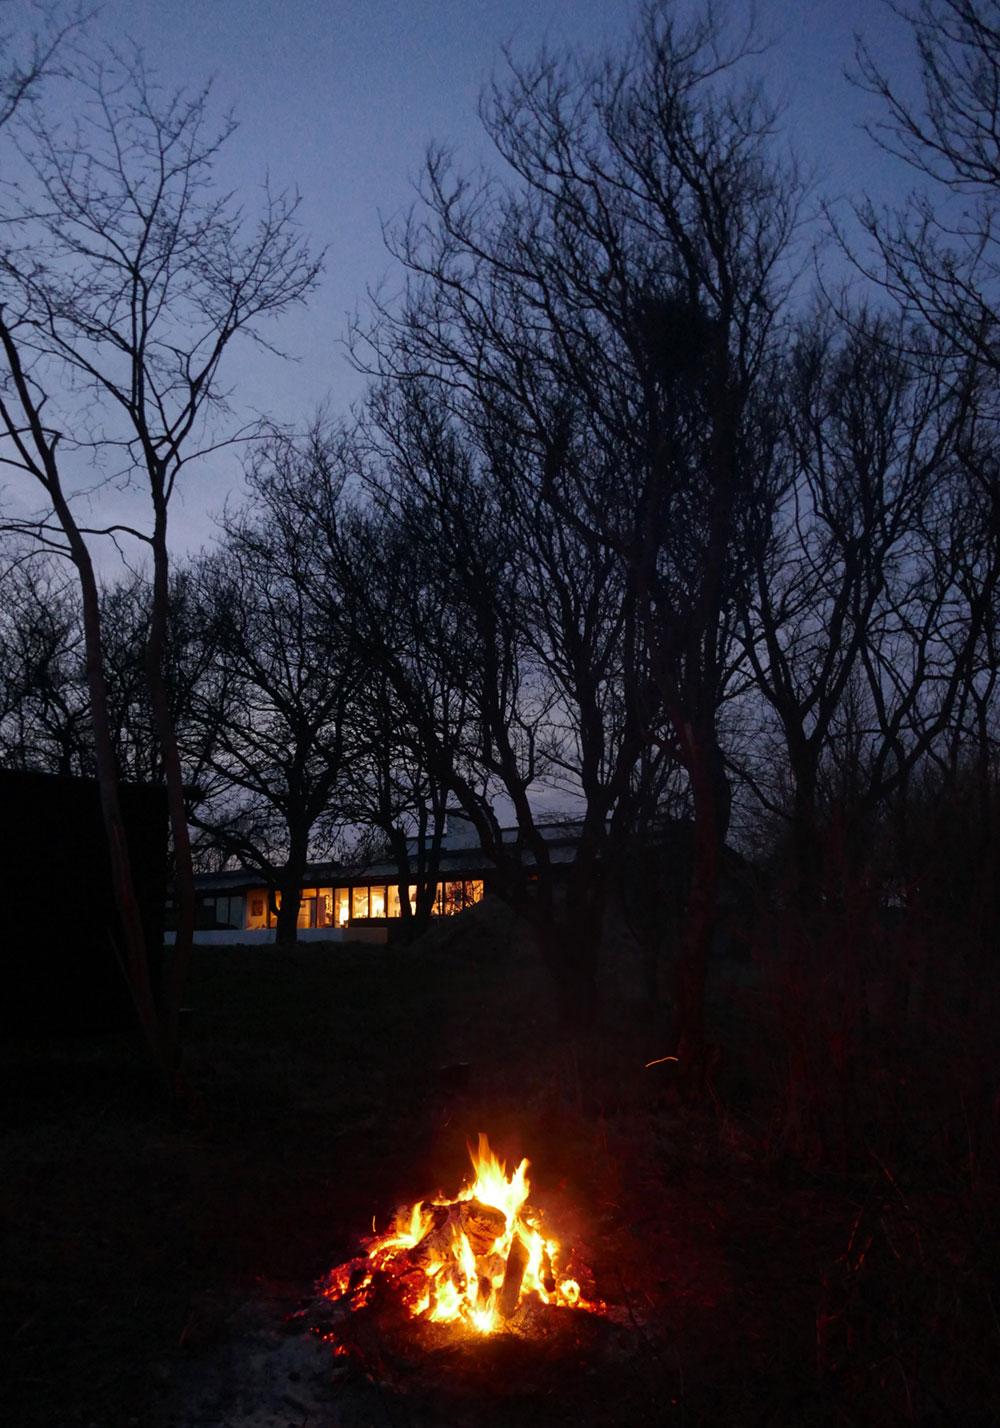 vilhfire